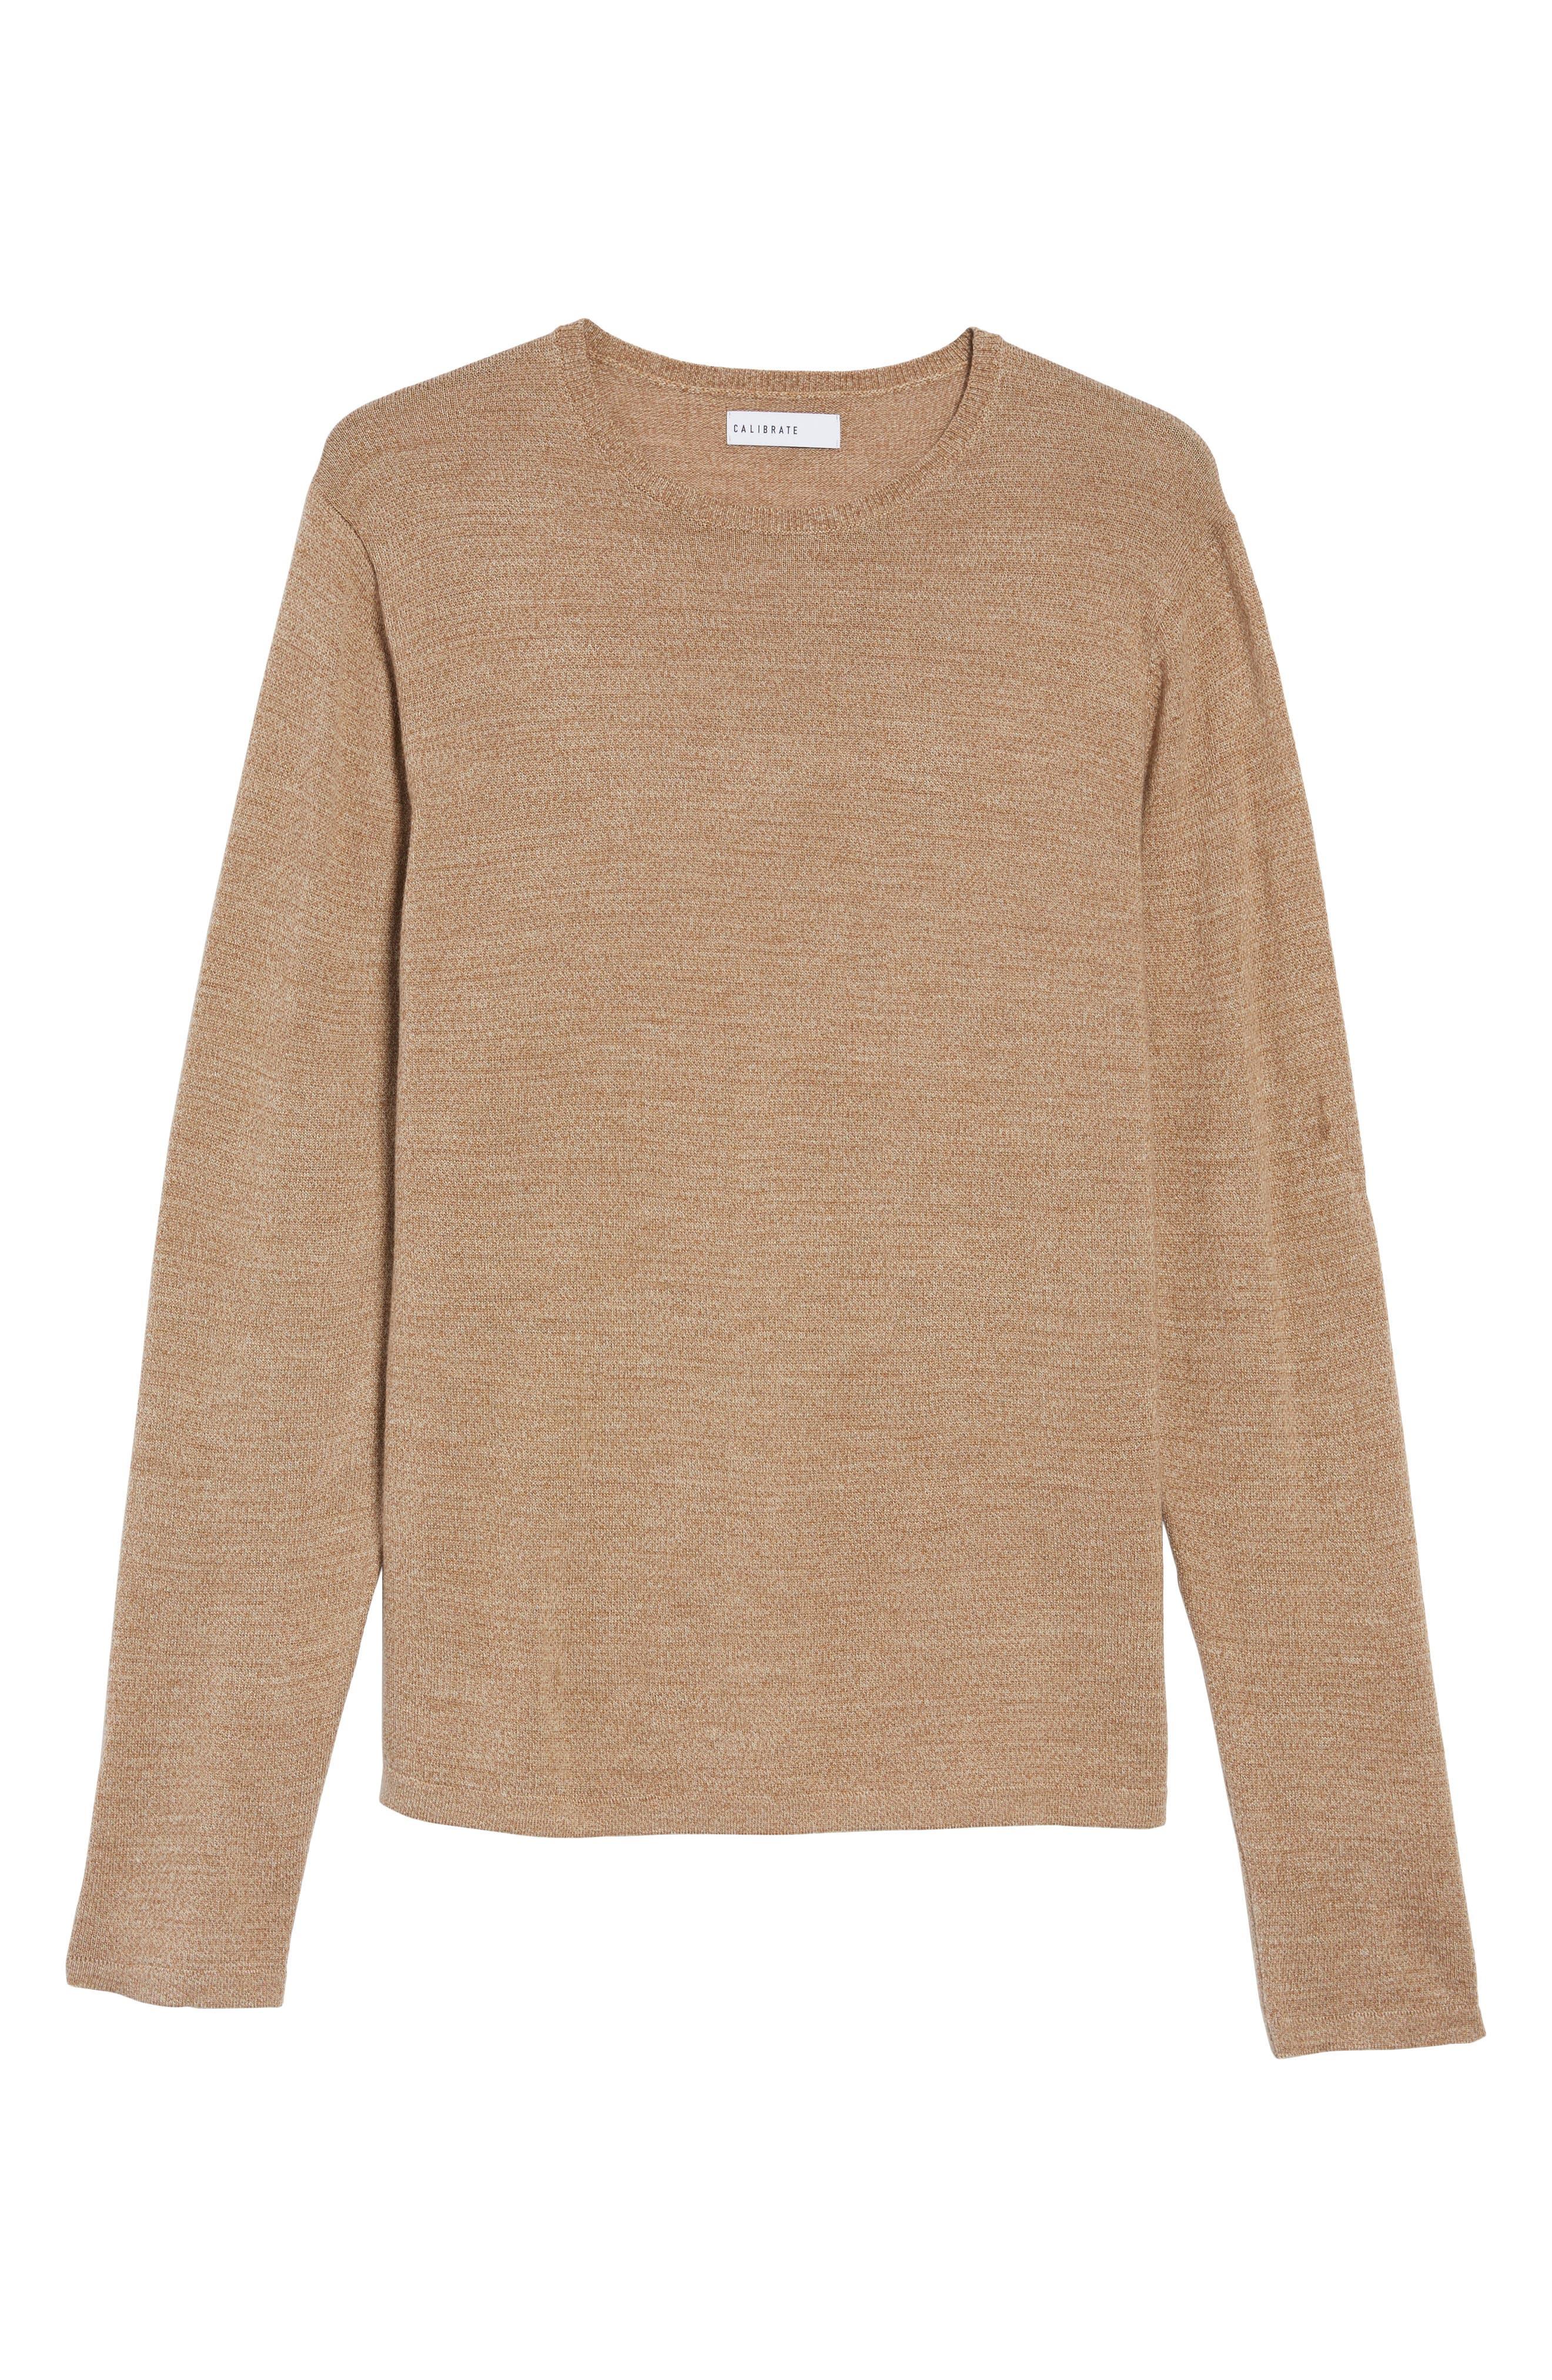 Merino Blend Crewneck Sweater,                             Alternate thumbnail 23, color,